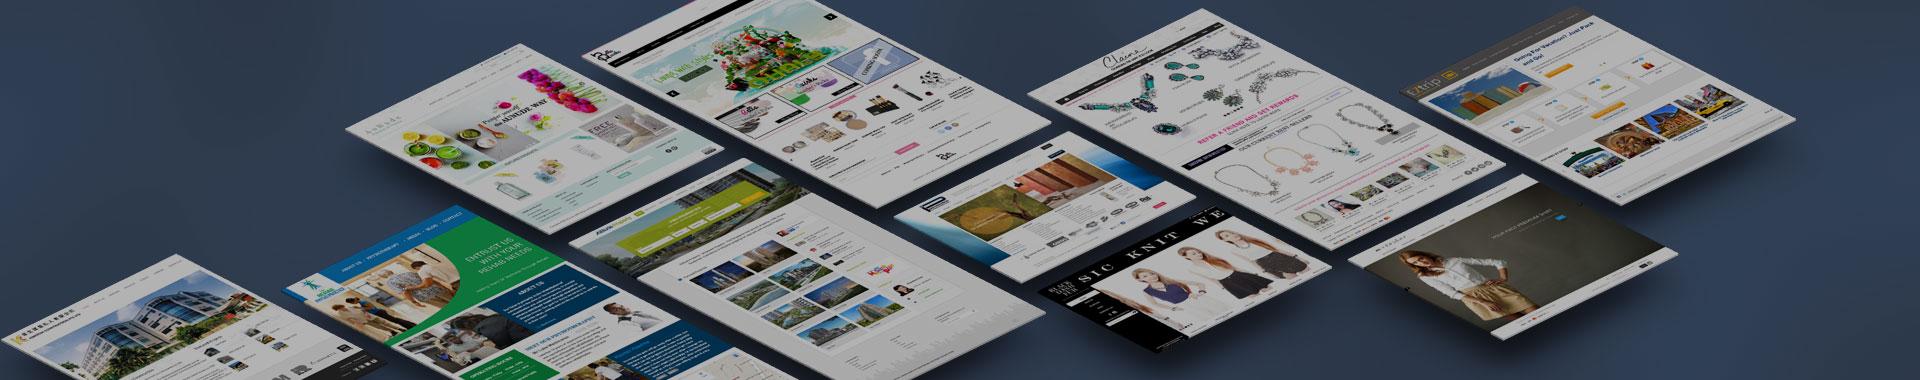 Website Design Singapore - The Pixie Box